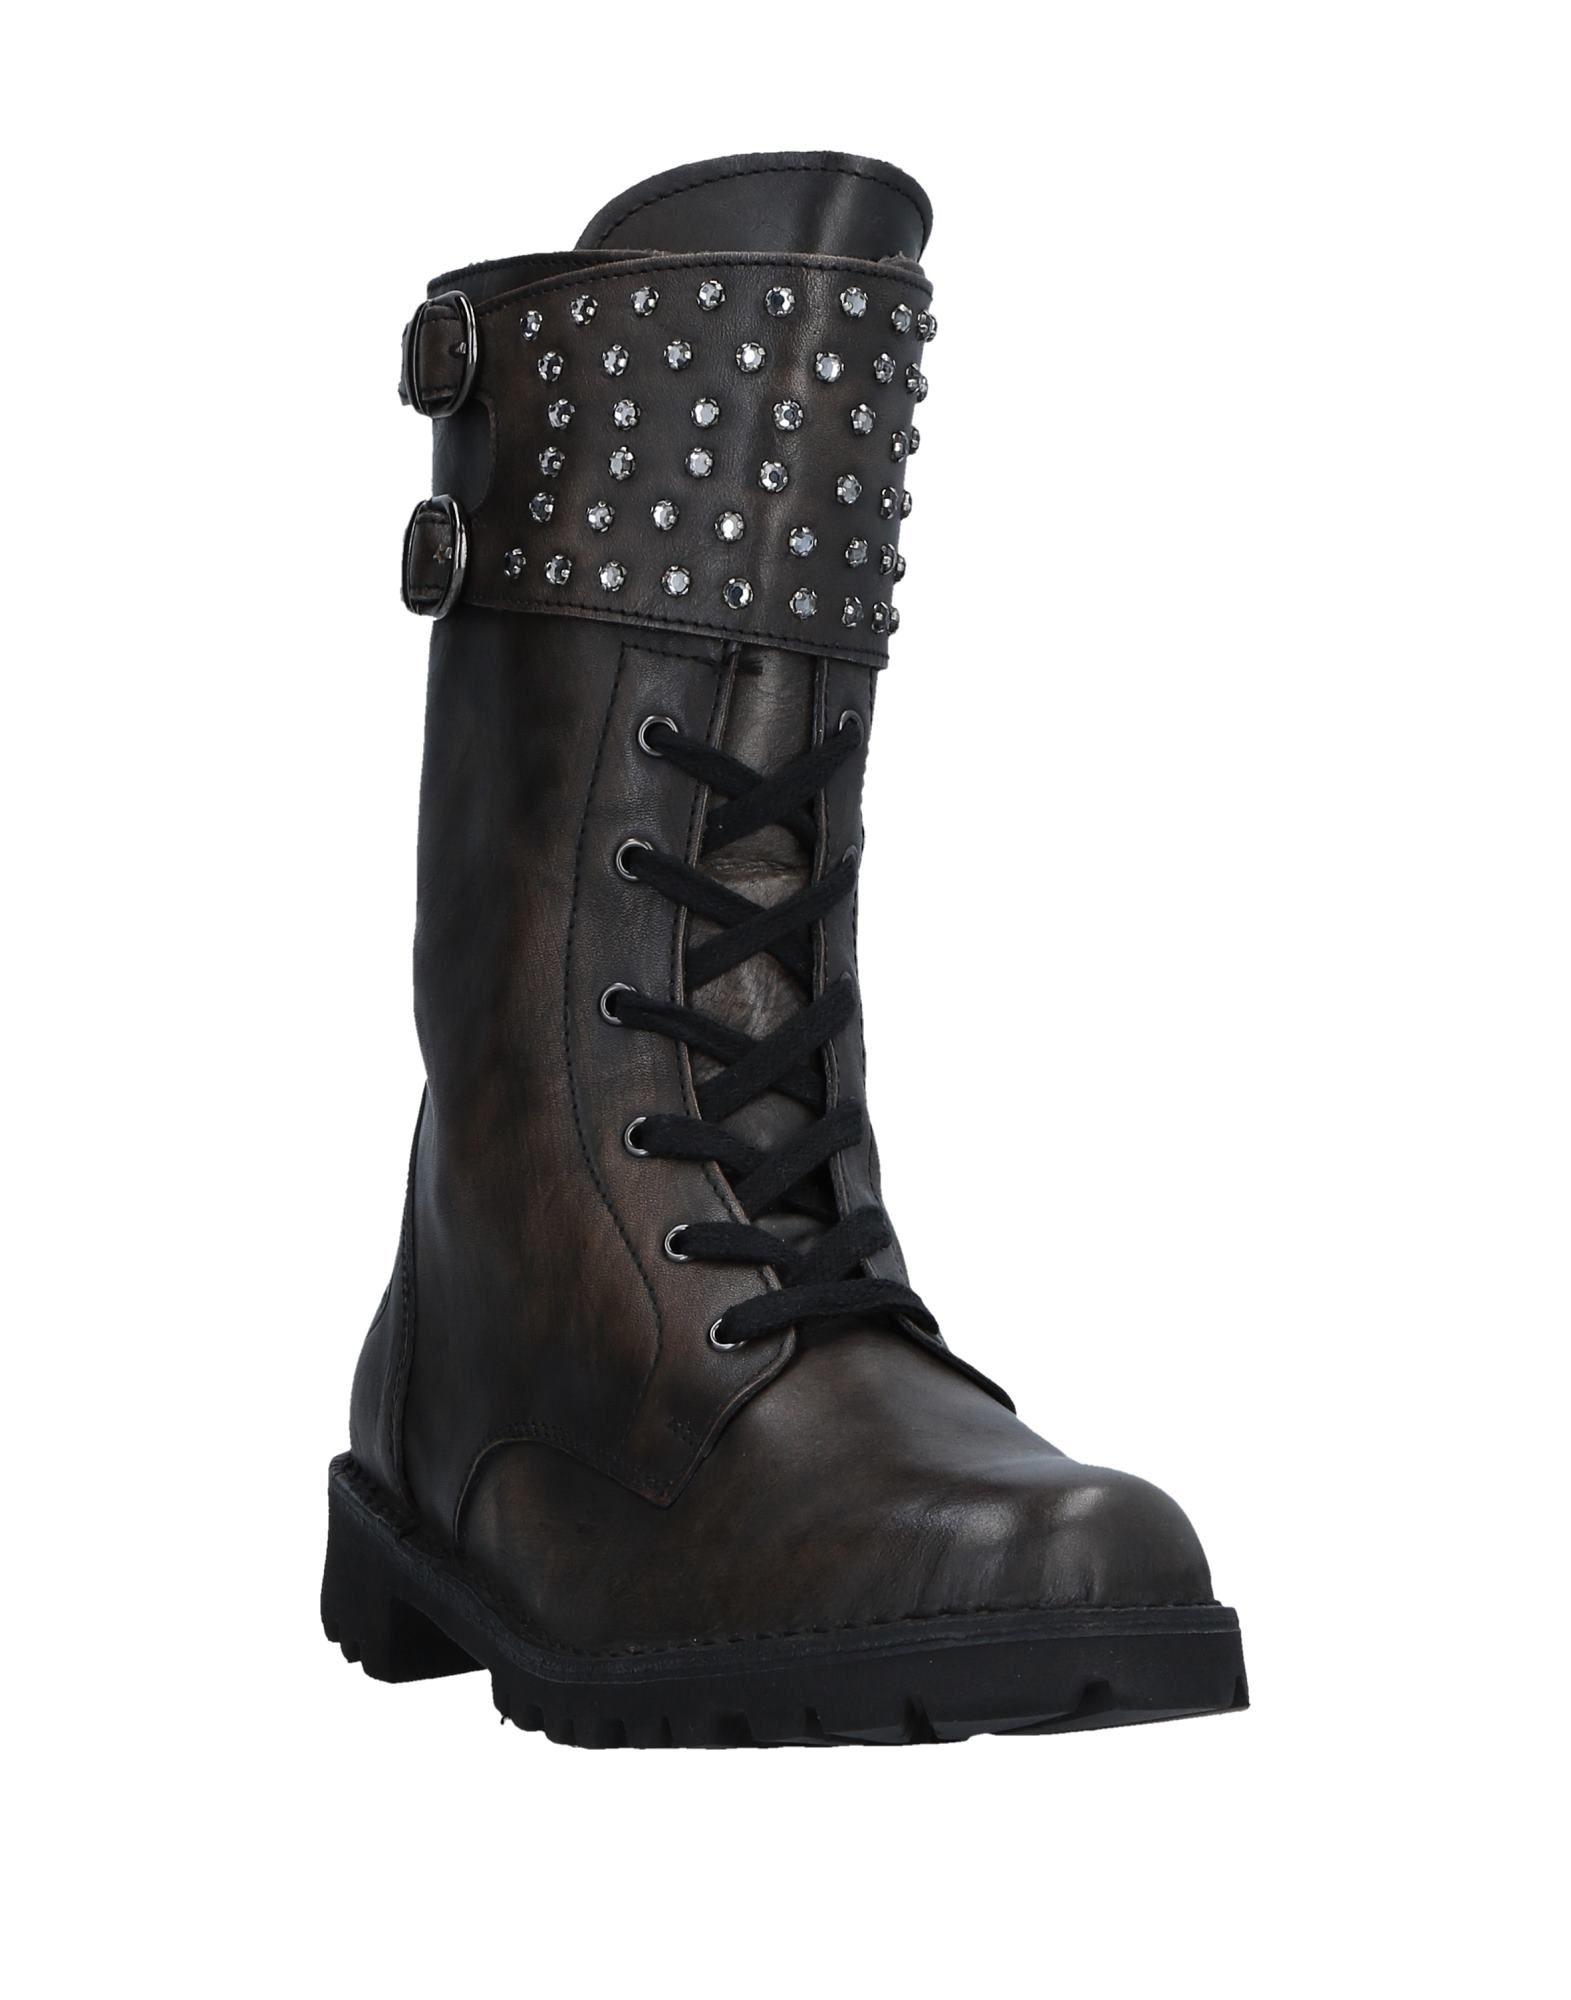 Stilvolle billige Schuhe Schuhe Schuhe Twin 11534220EK 5a96be